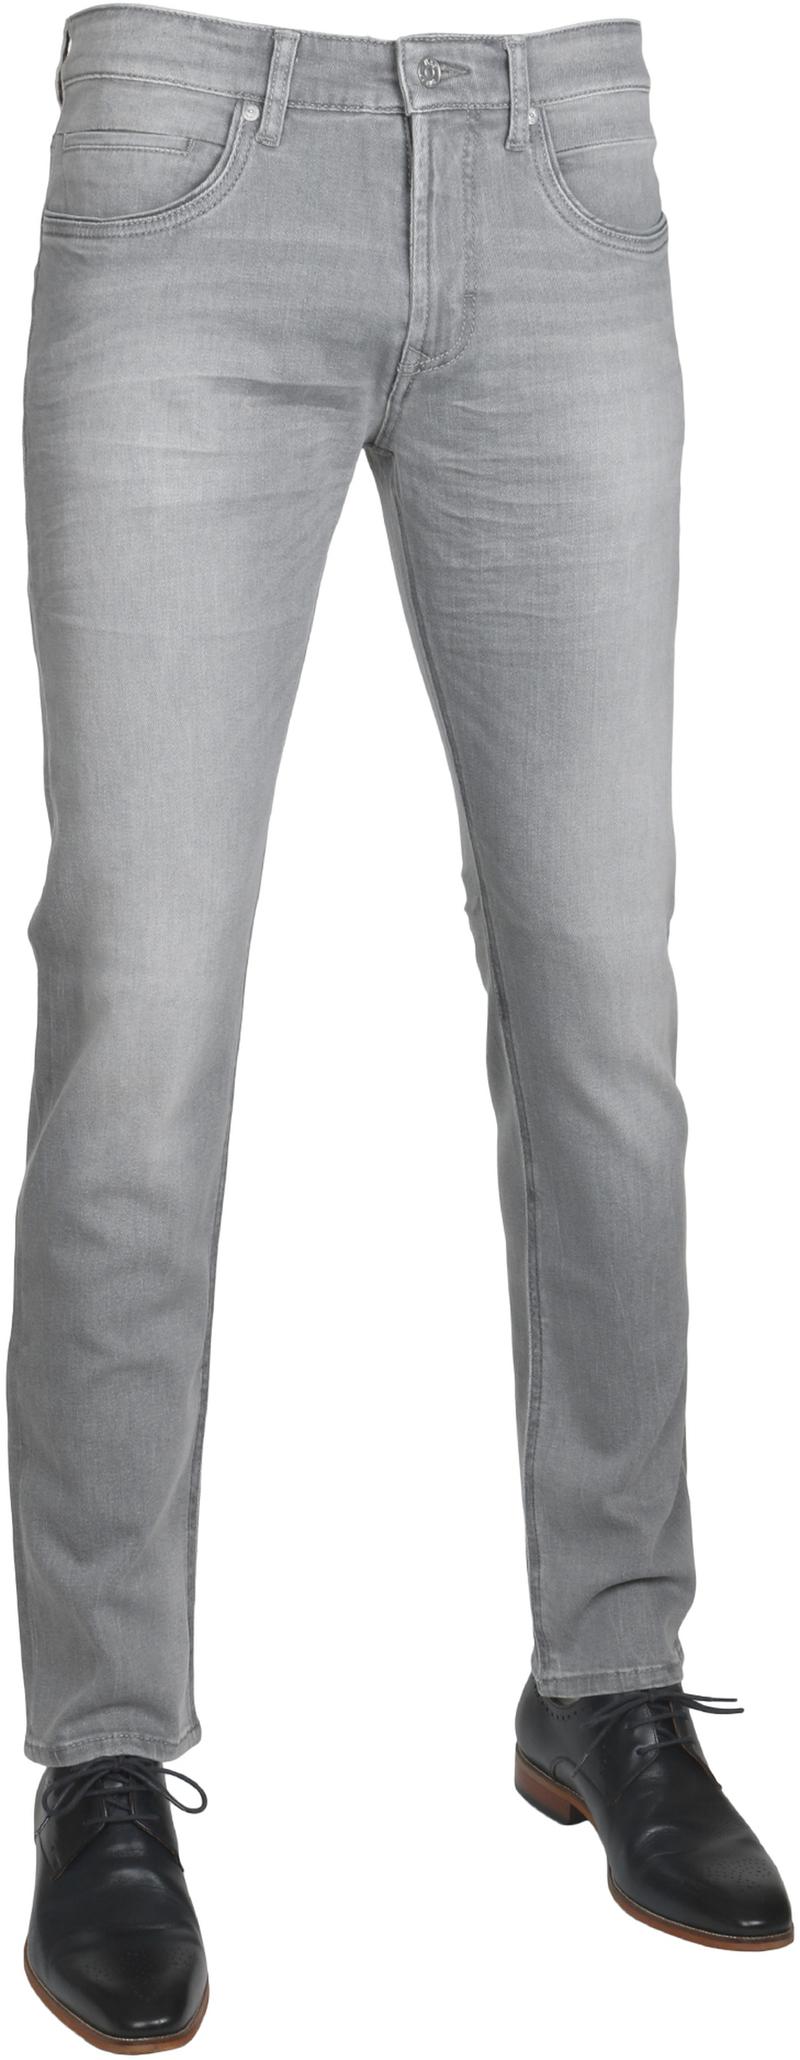 Mac Jeans Arne Grey H819 photo 0